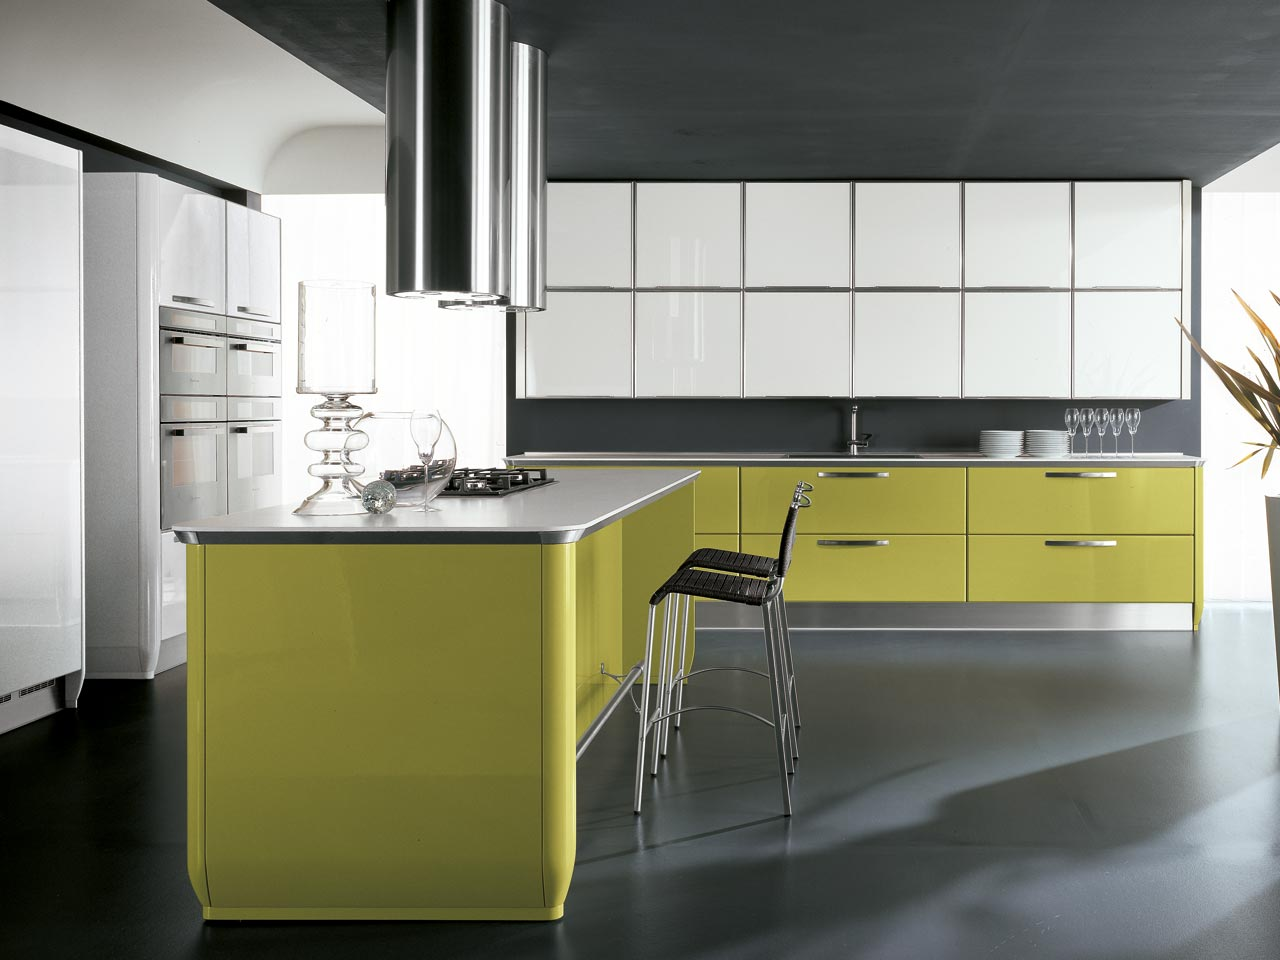 katia cucina componibile by cucine lube